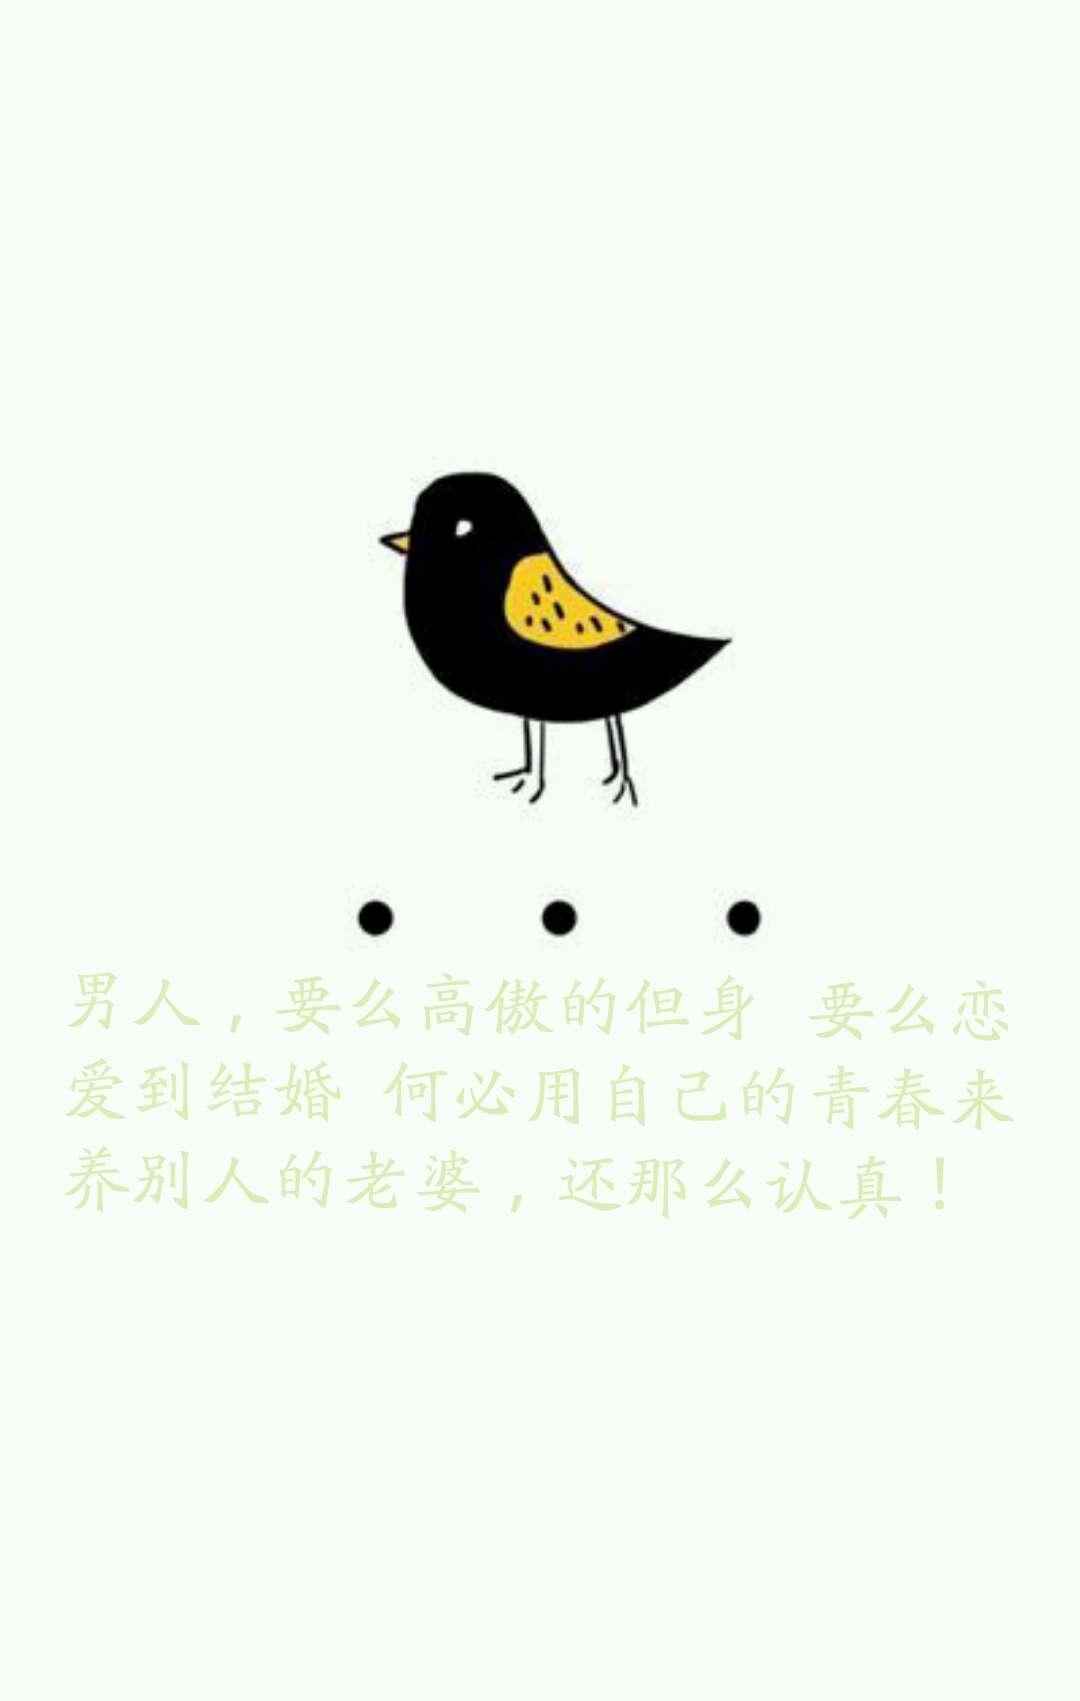 http://www.58100.com/pid/35181.html